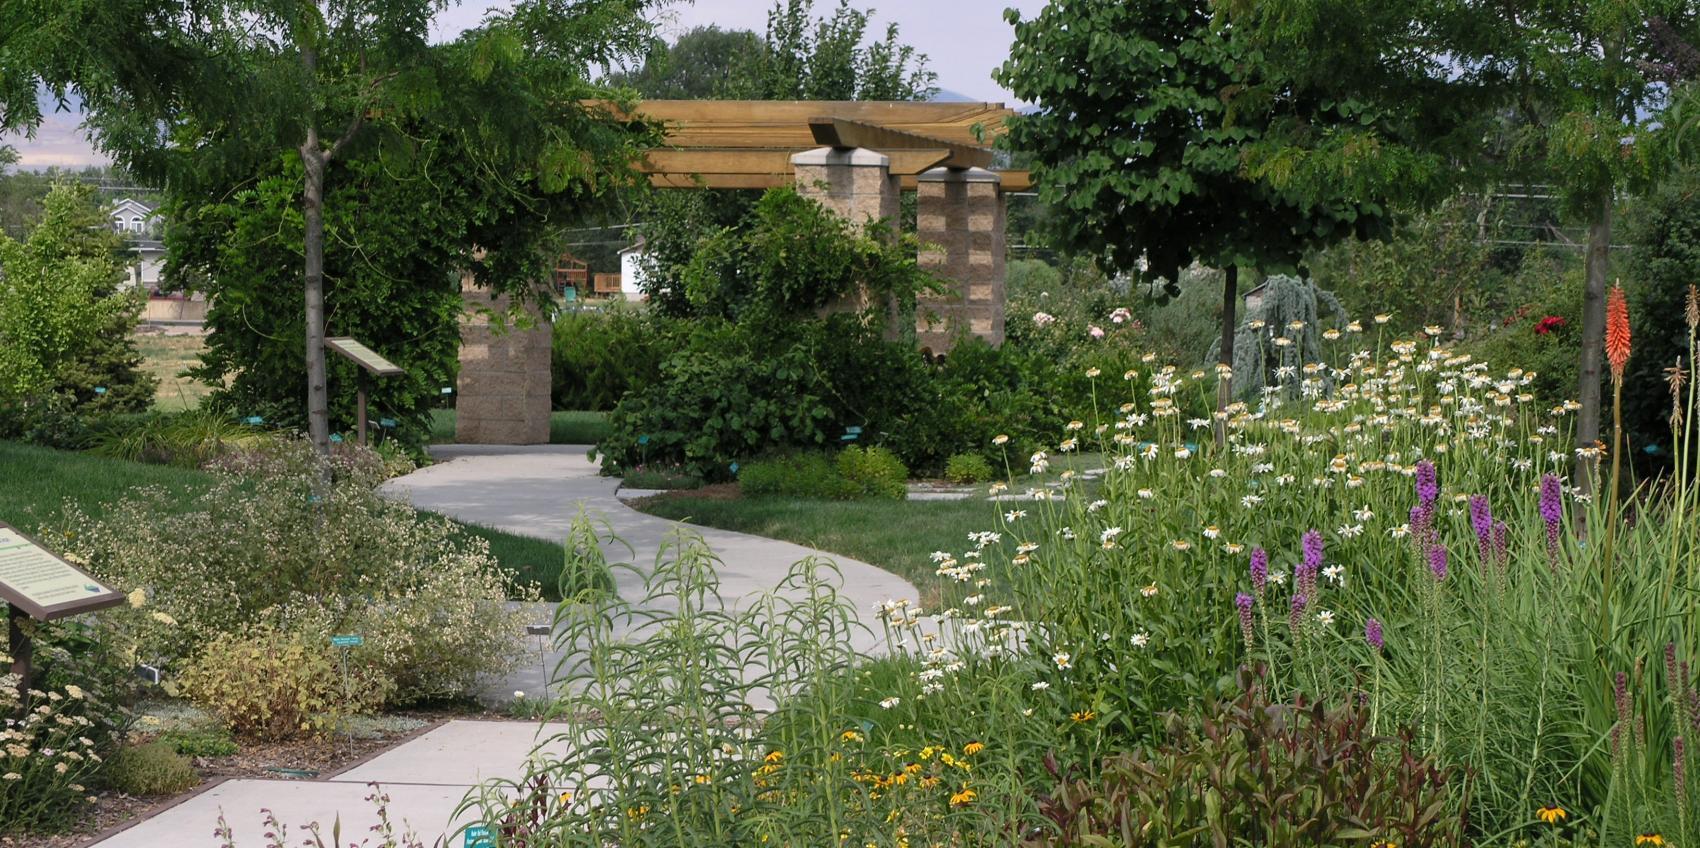 Water Conservation Garden American Public Gardens Association